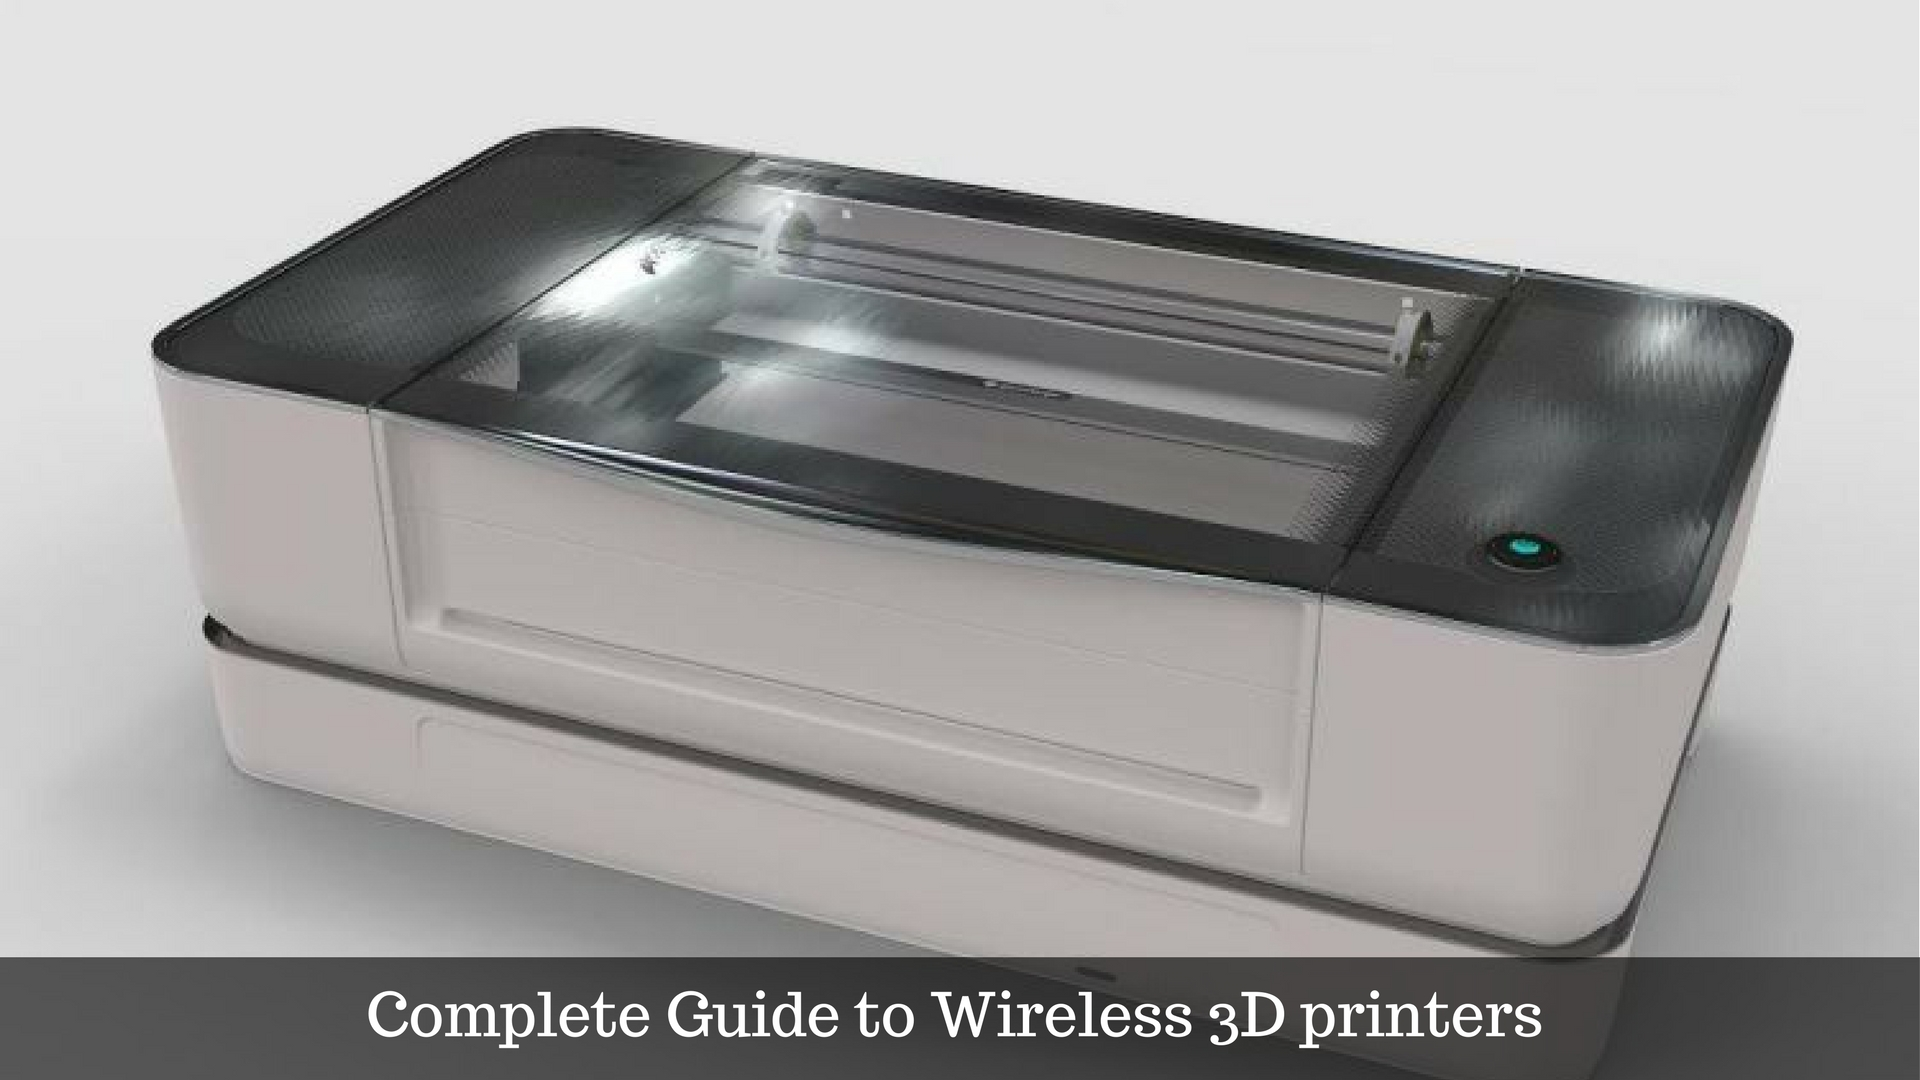 Wireless 3D printers